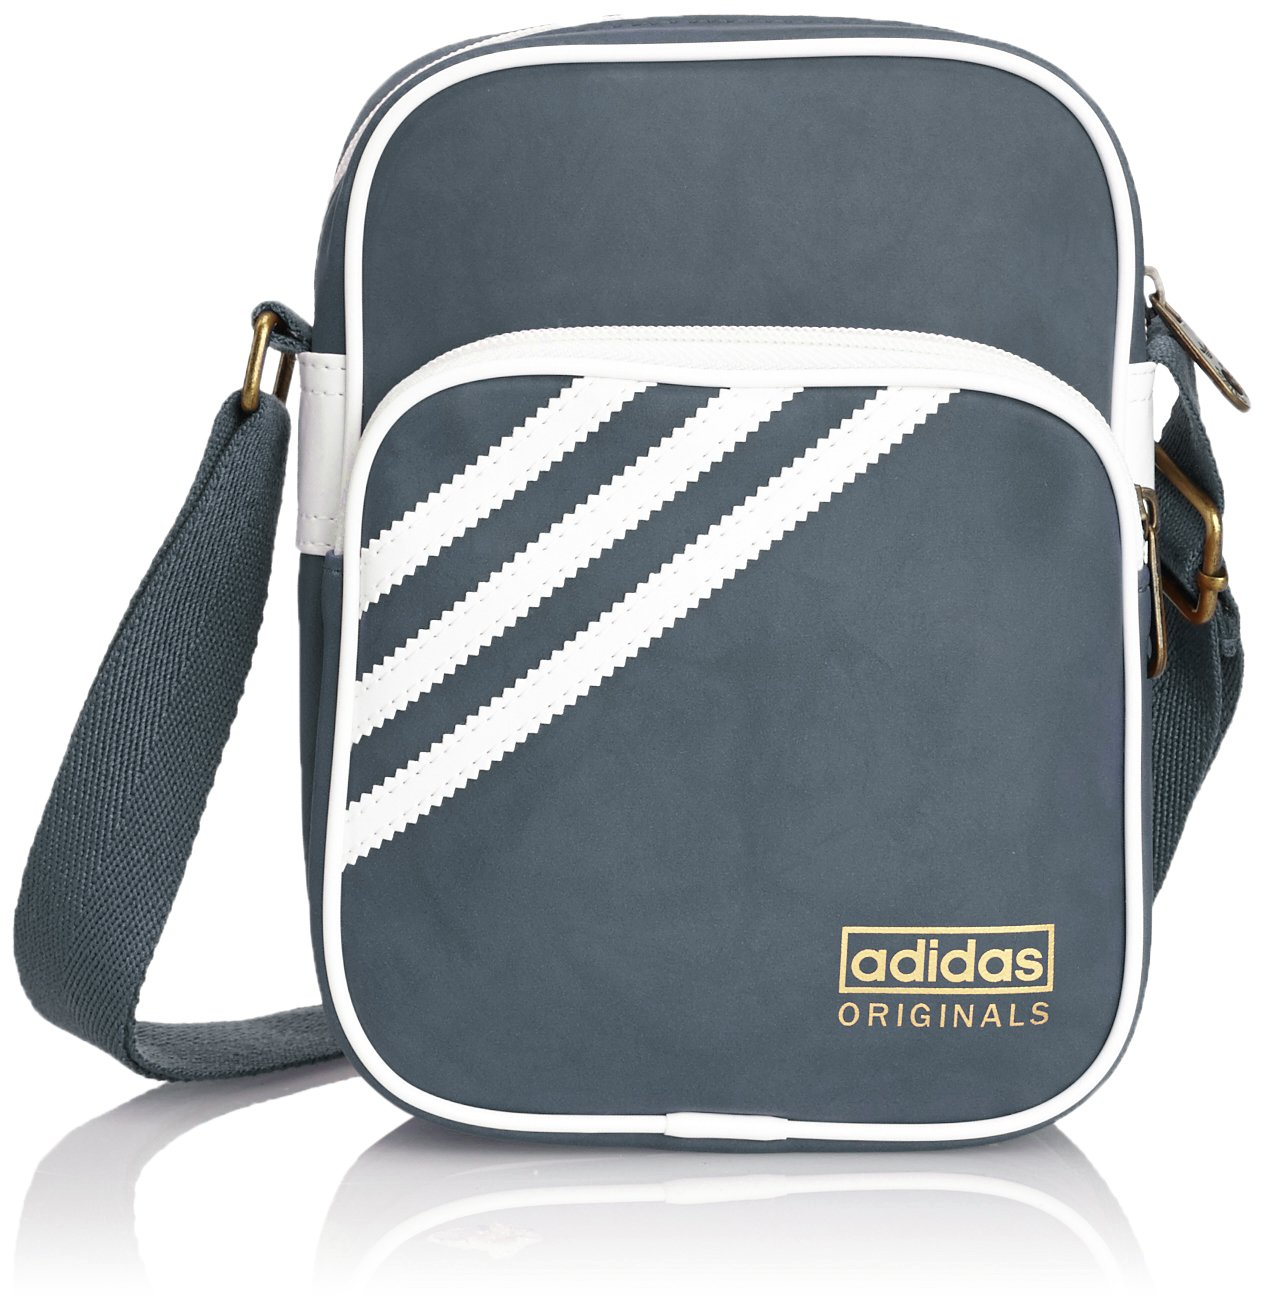 Menamp39s Bags  adidas United States